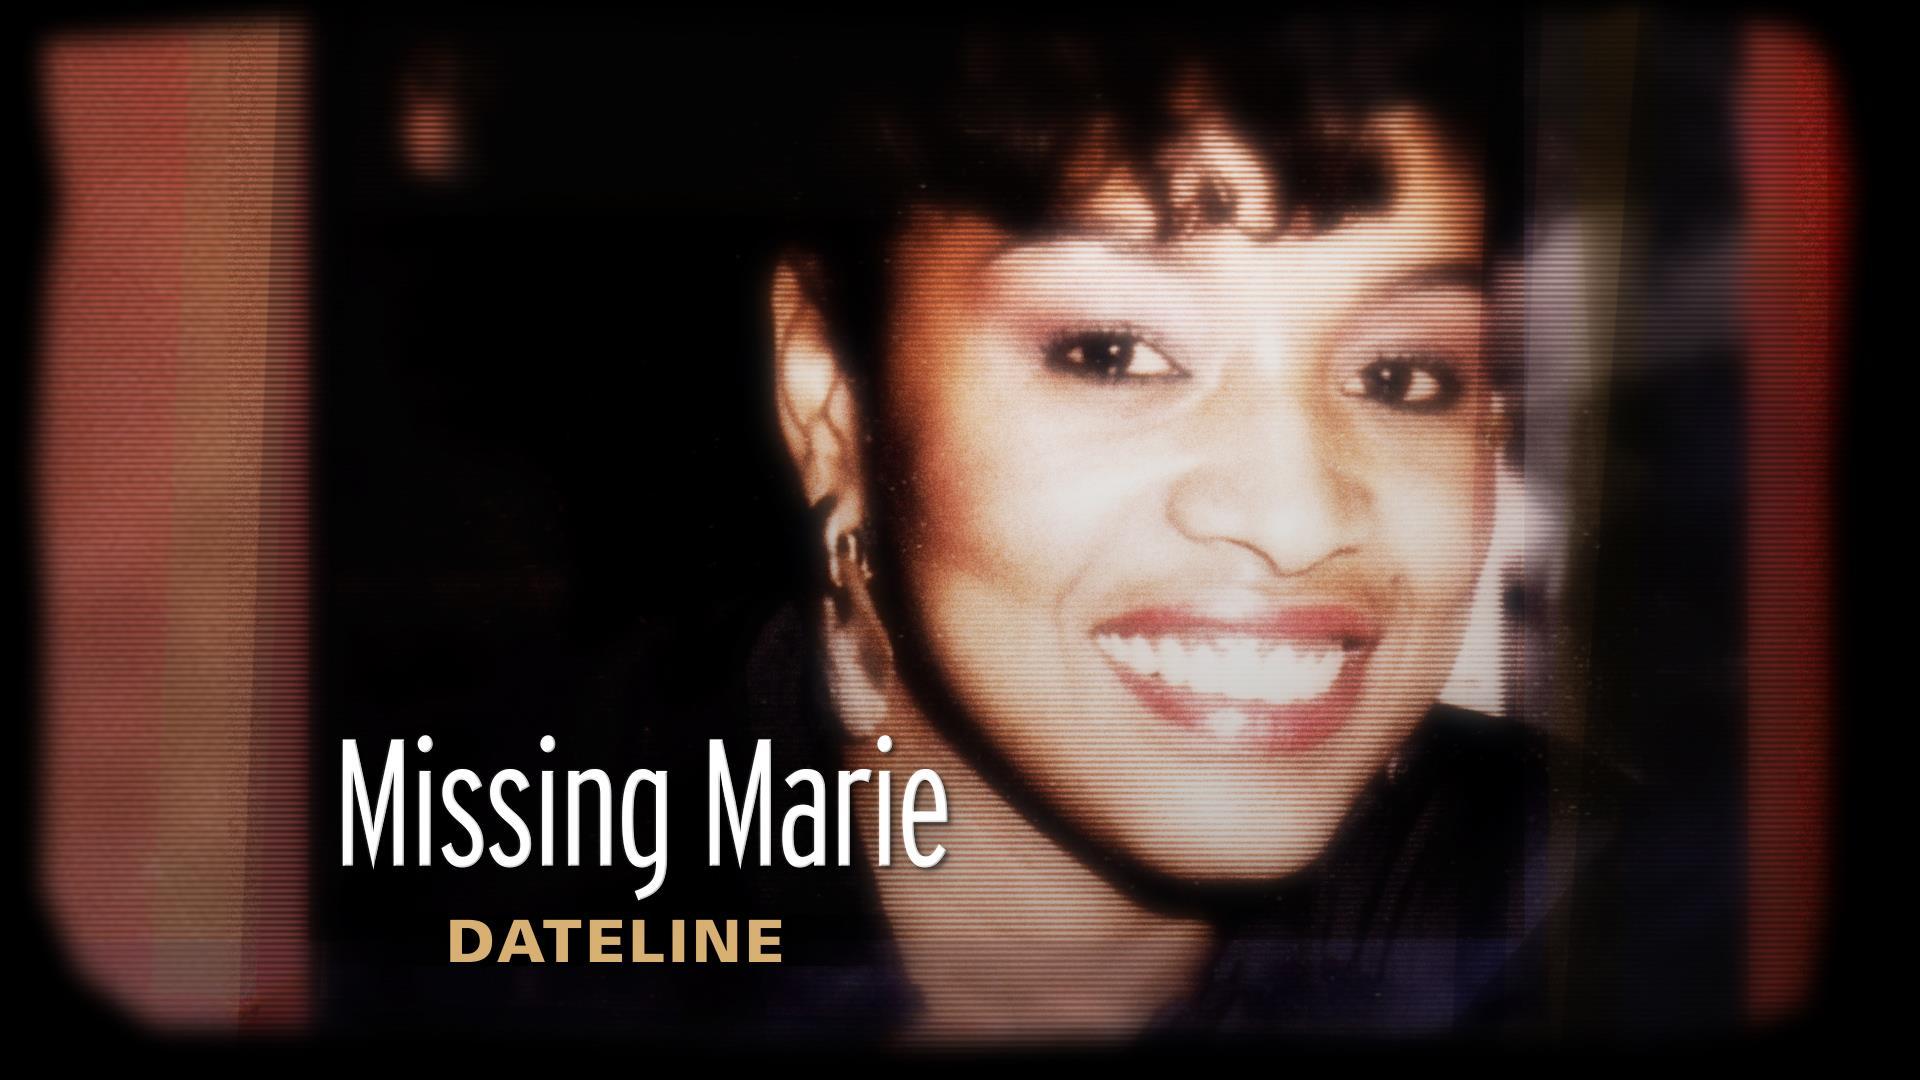 Dateline Trailer: Missing Marie